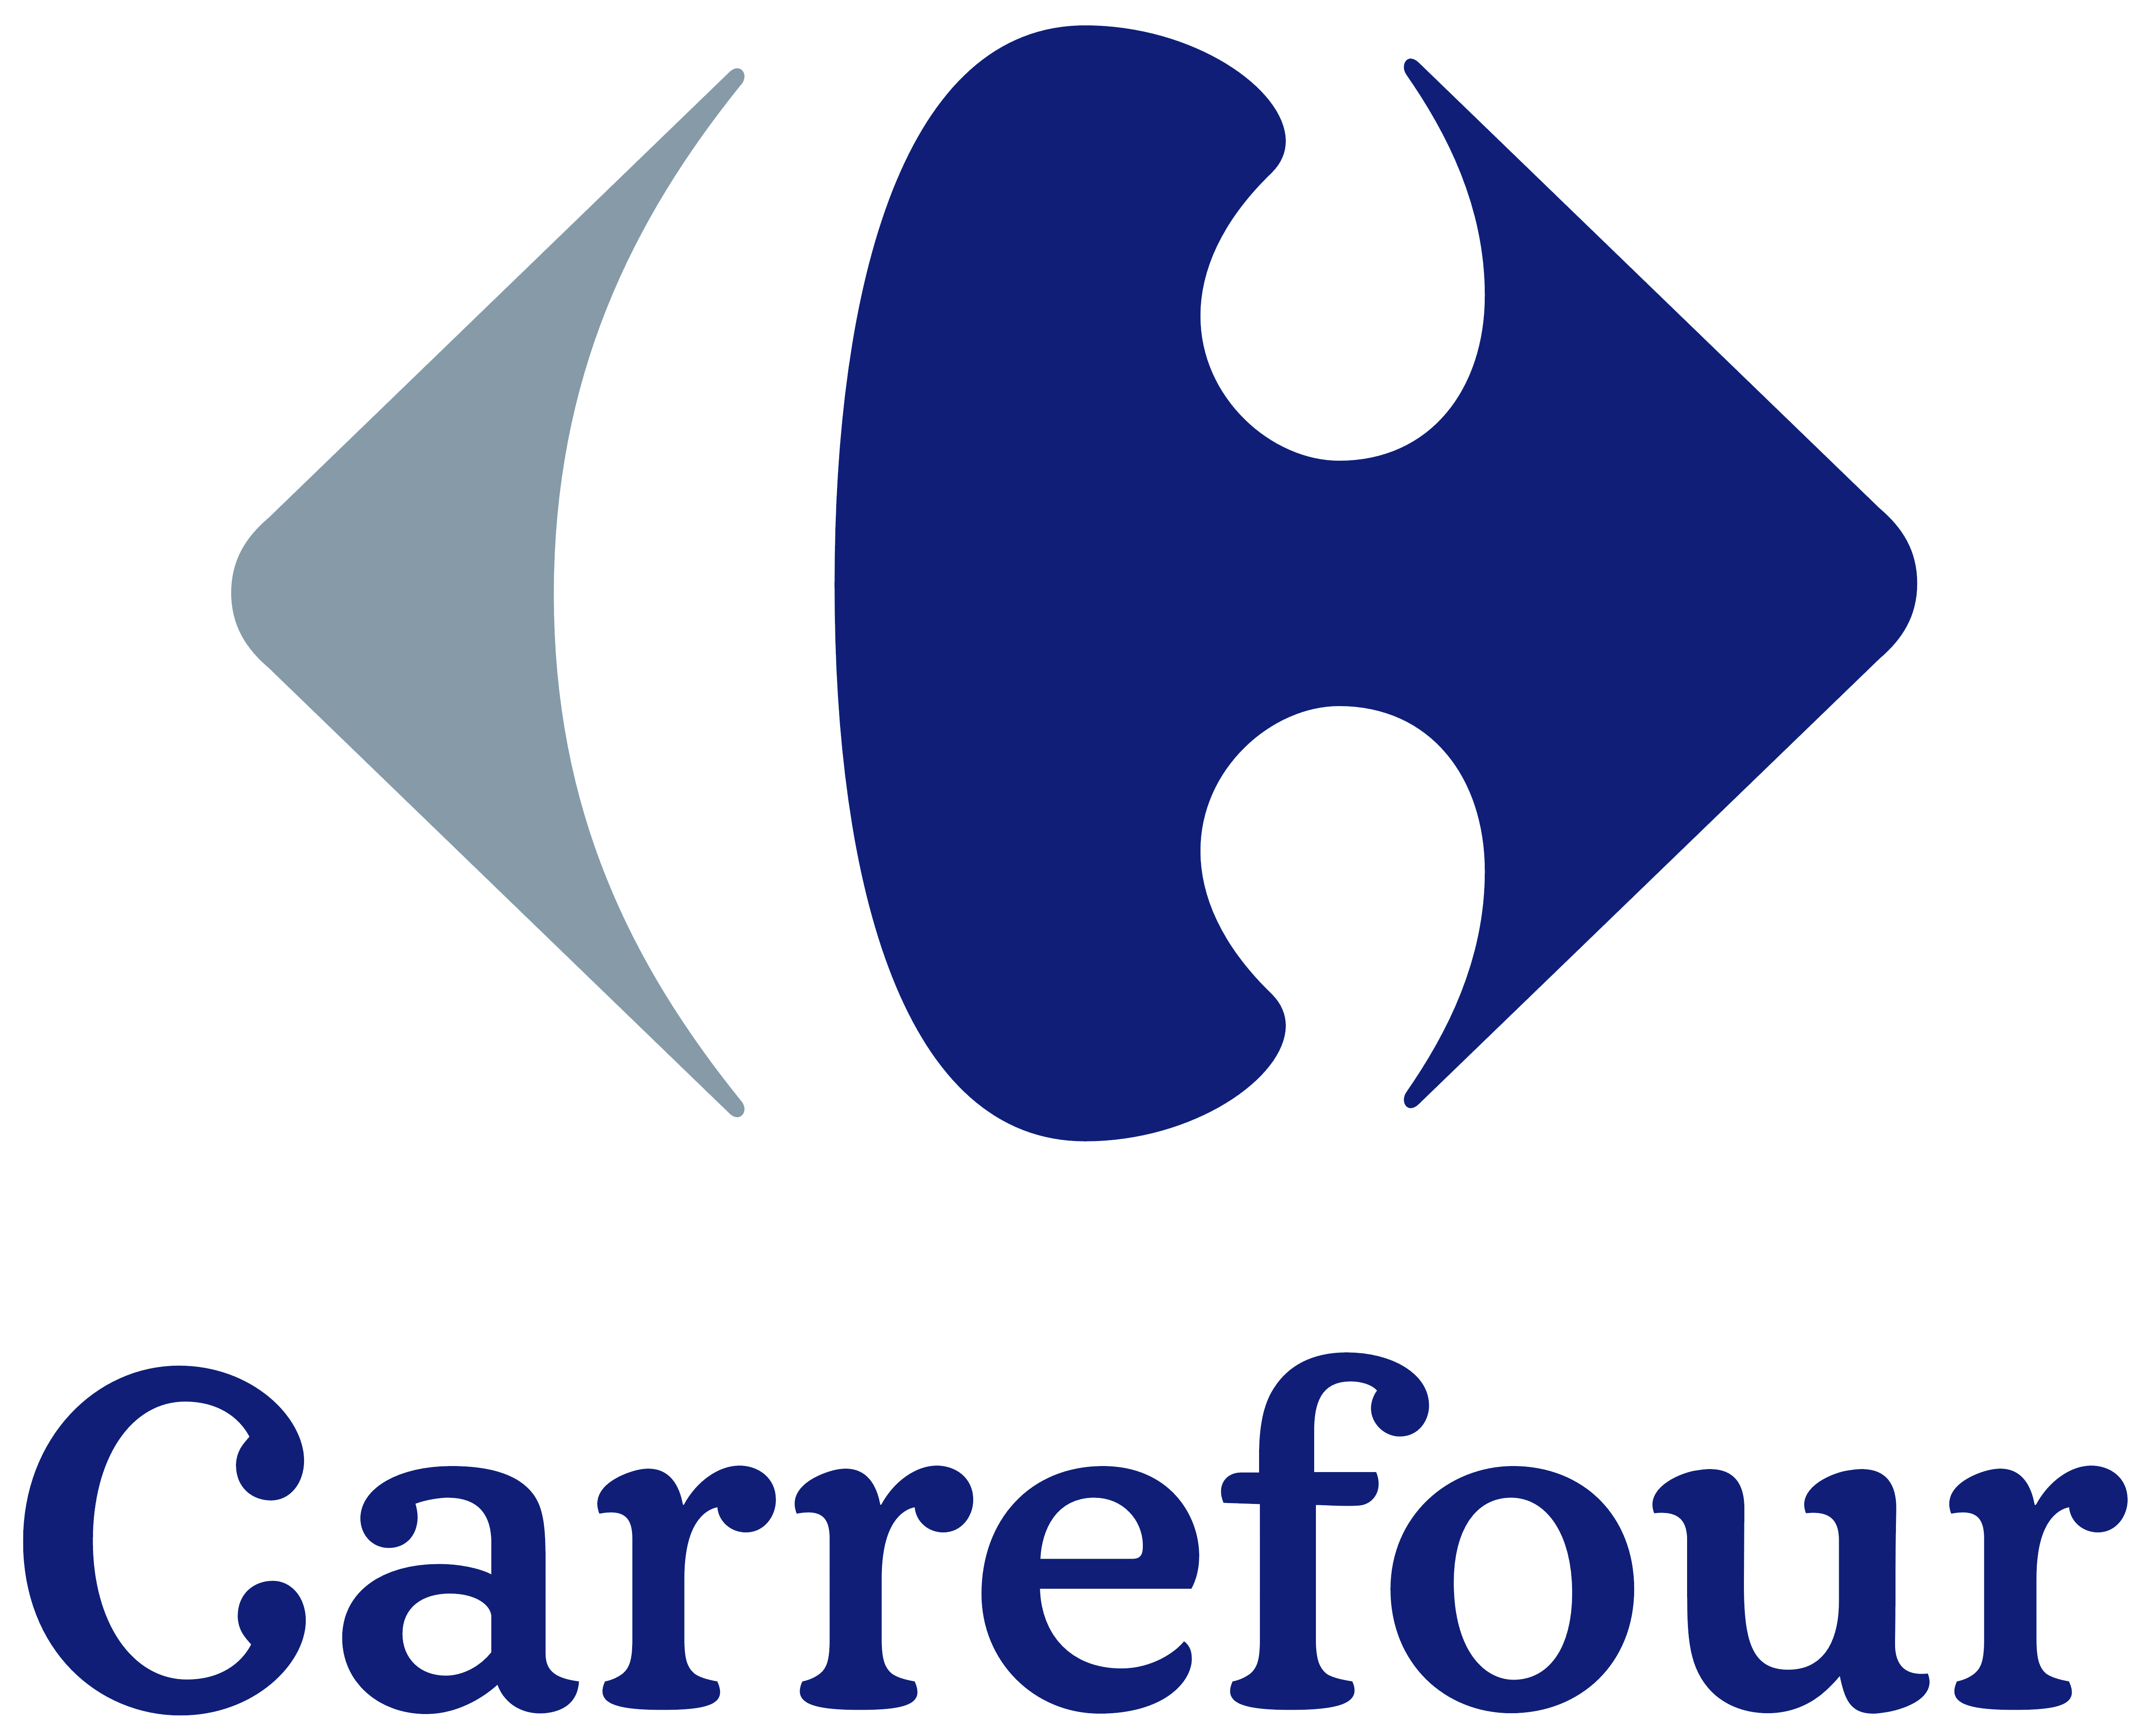 Carrefour – Logos Download - Carrefour Logo PNG